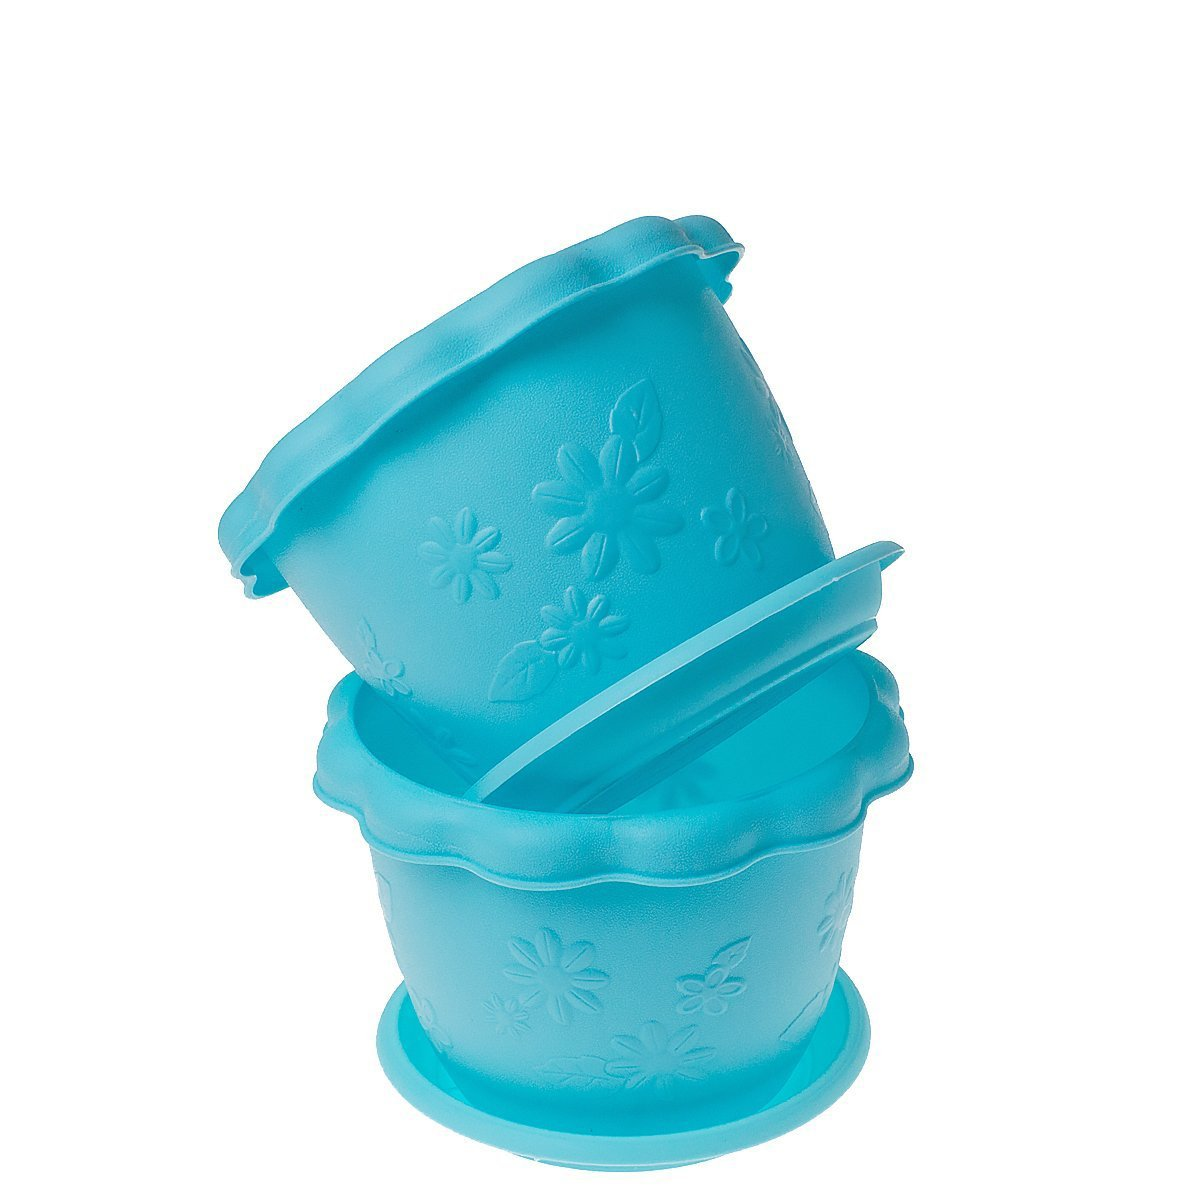 Saim Plastic Plant Pot, Stylish Garden Nursery Plant Planter Holder Pots with Removal Saucer for Flower, Herbs, Transplanting, Seedlings, Pack of 2(Light Blue)